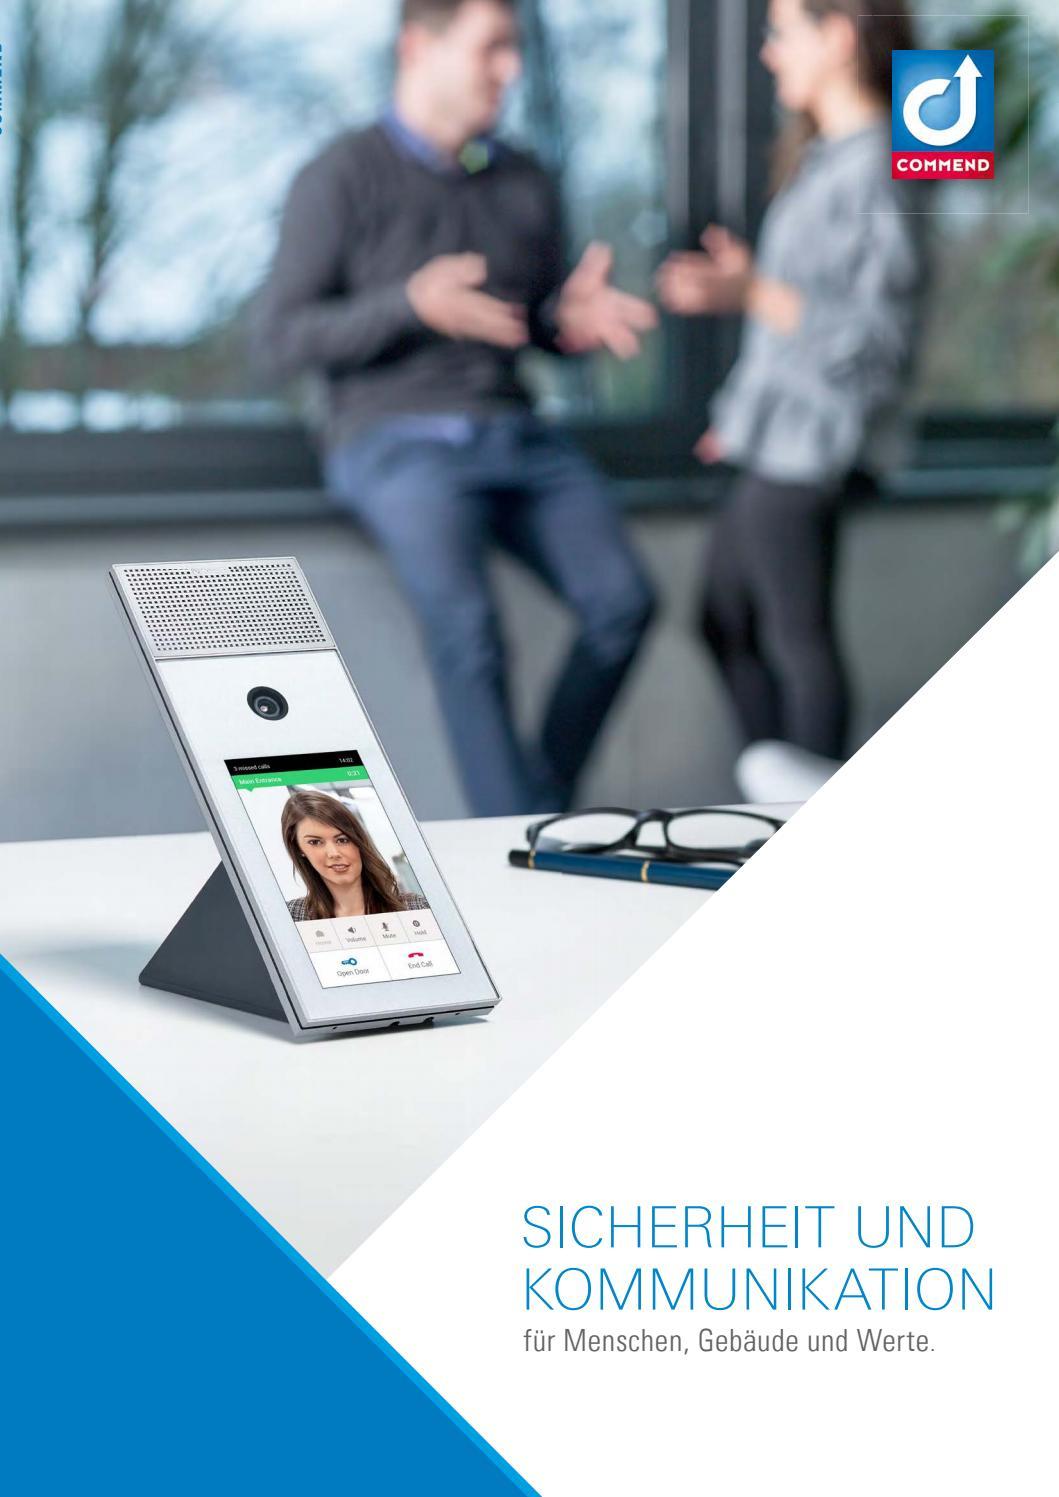 Commend Produktkatalog 2018/2019 – DEUTSCH by Commend International ...